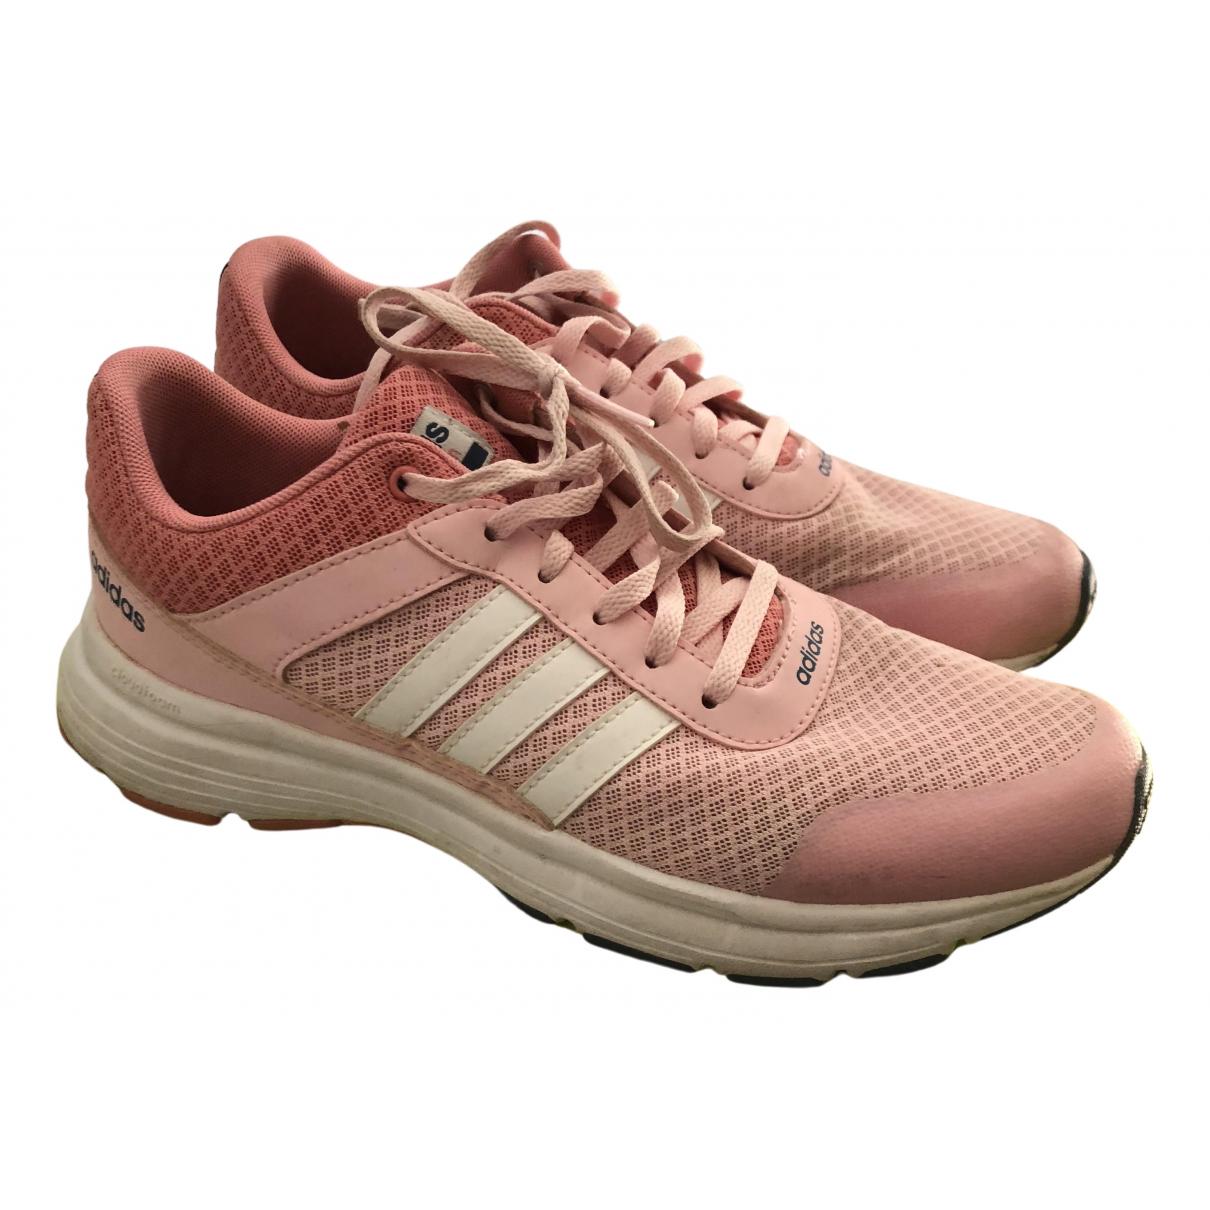 Adidas - Baskets   pour femme - rose